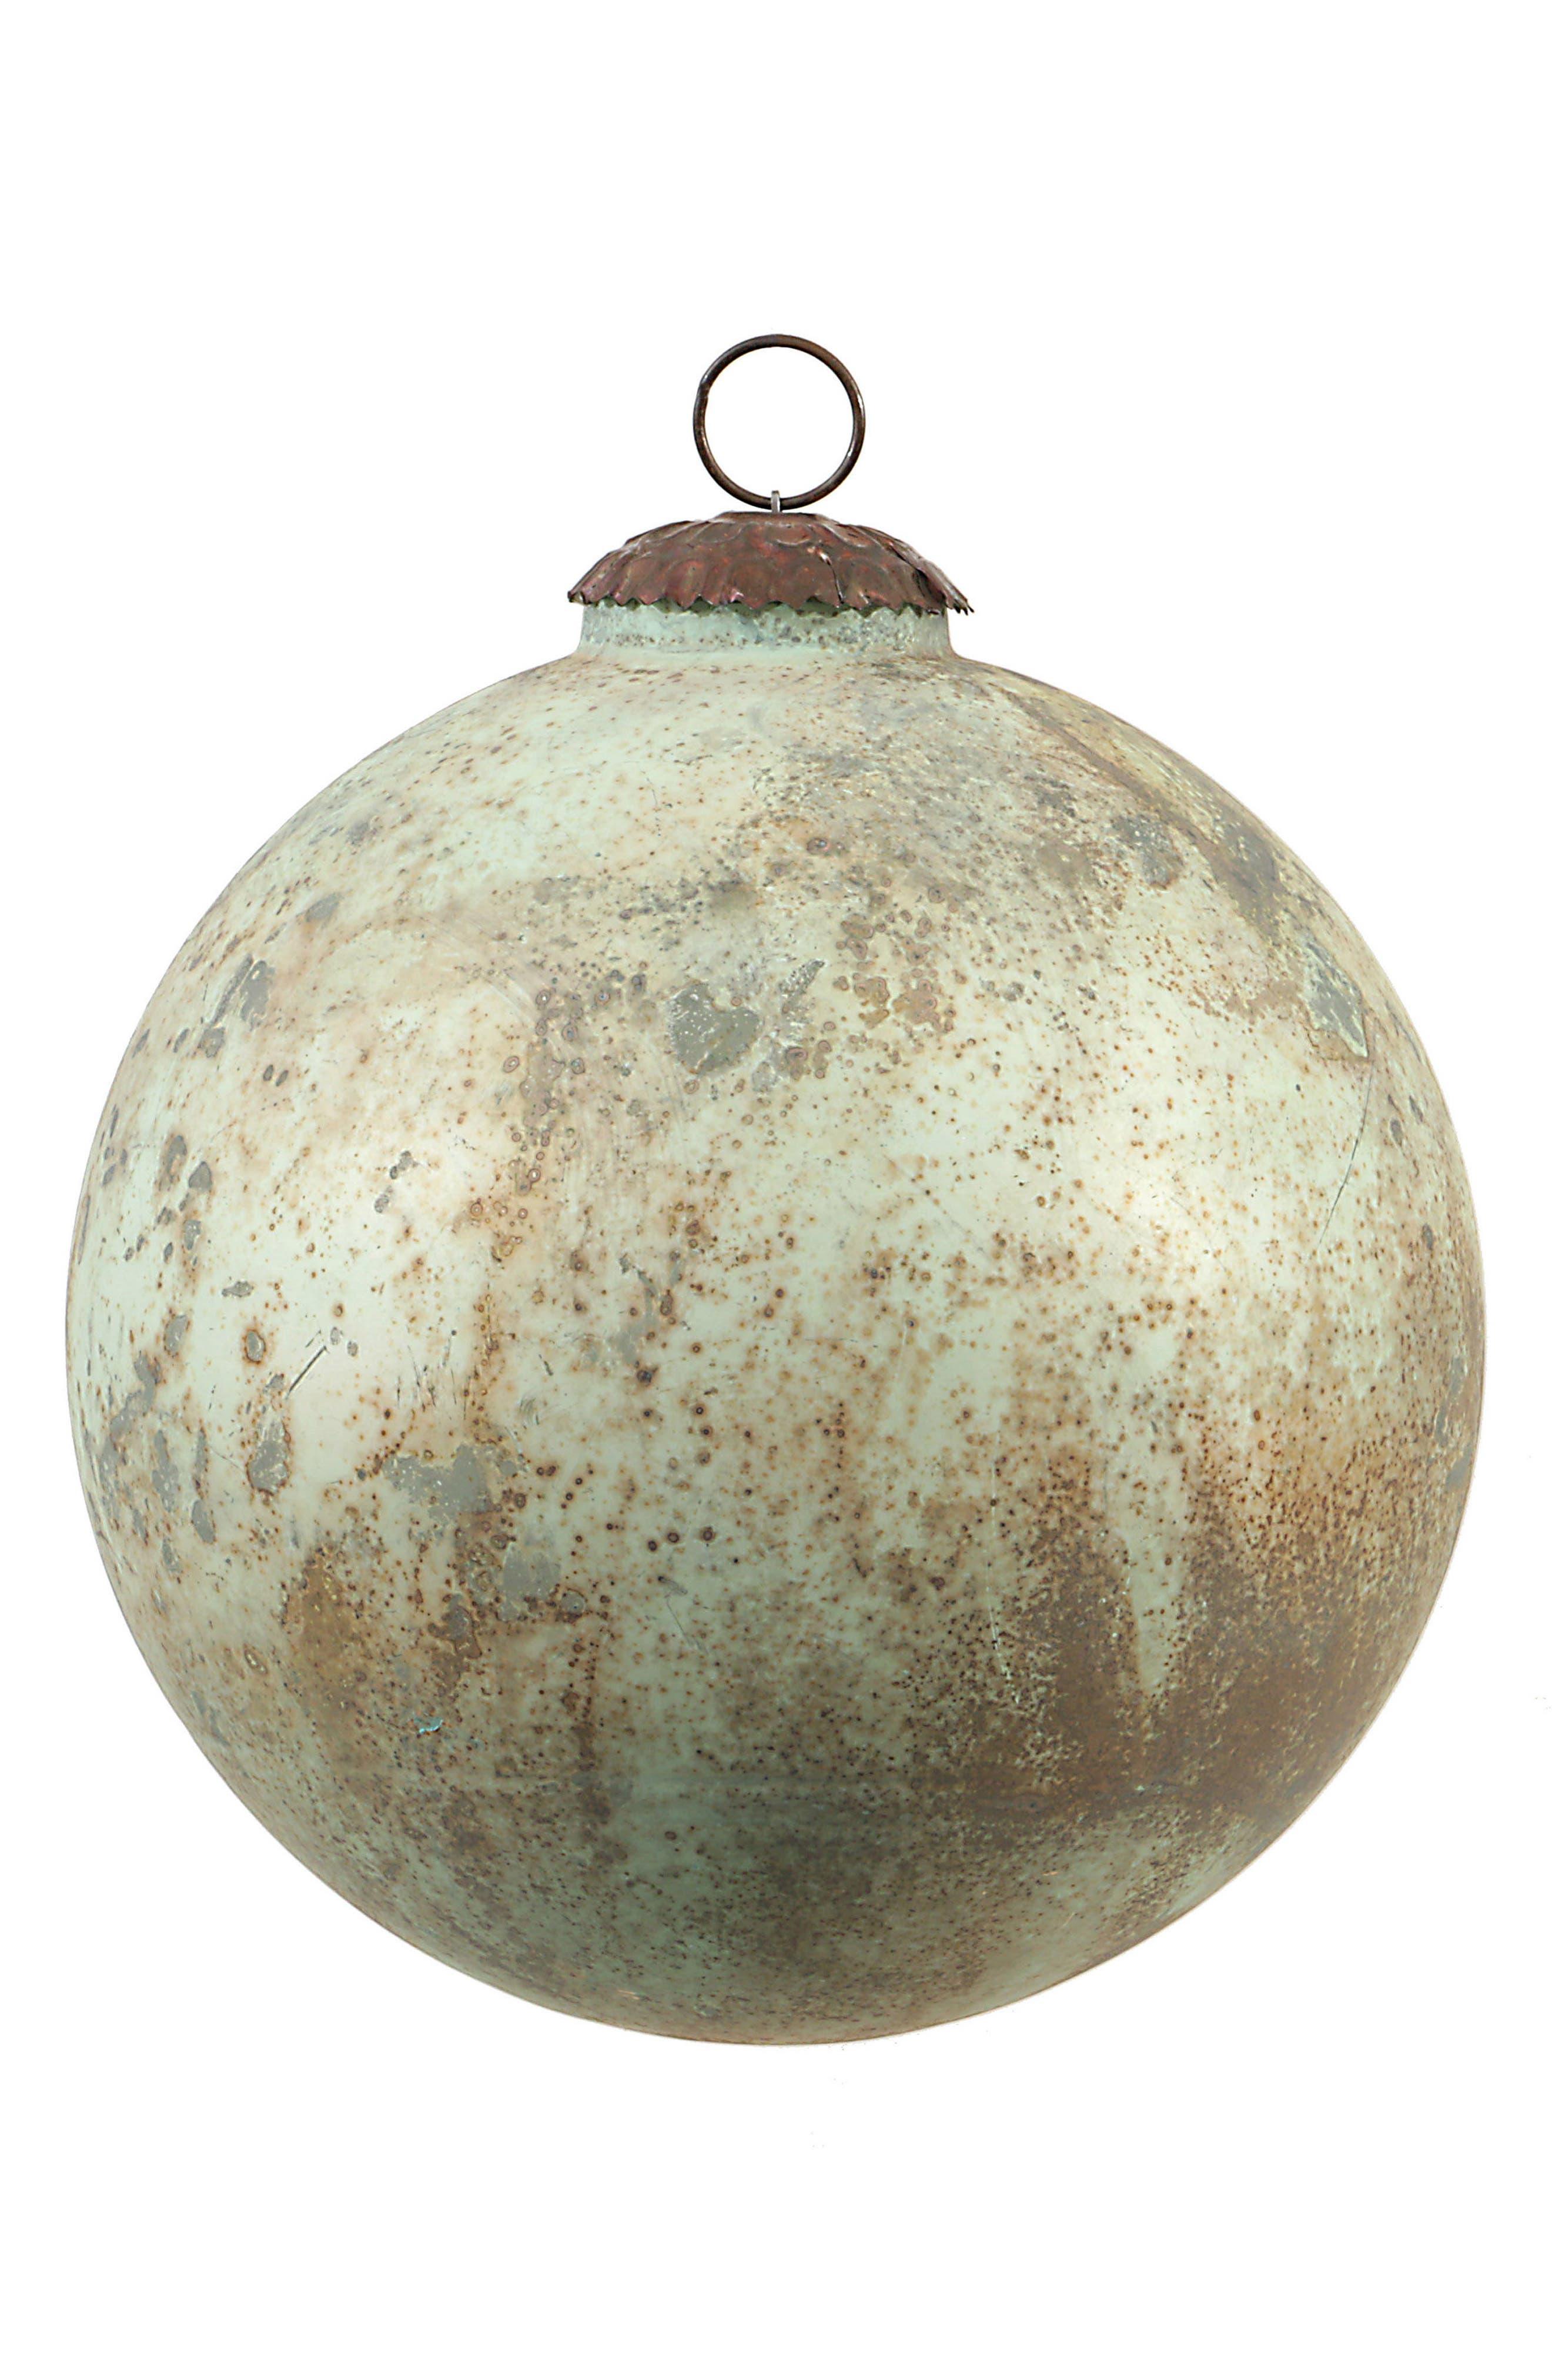 Marbled Mercury Glass Ball Ornament,                             Main thumbnail 1, color,                             Blue